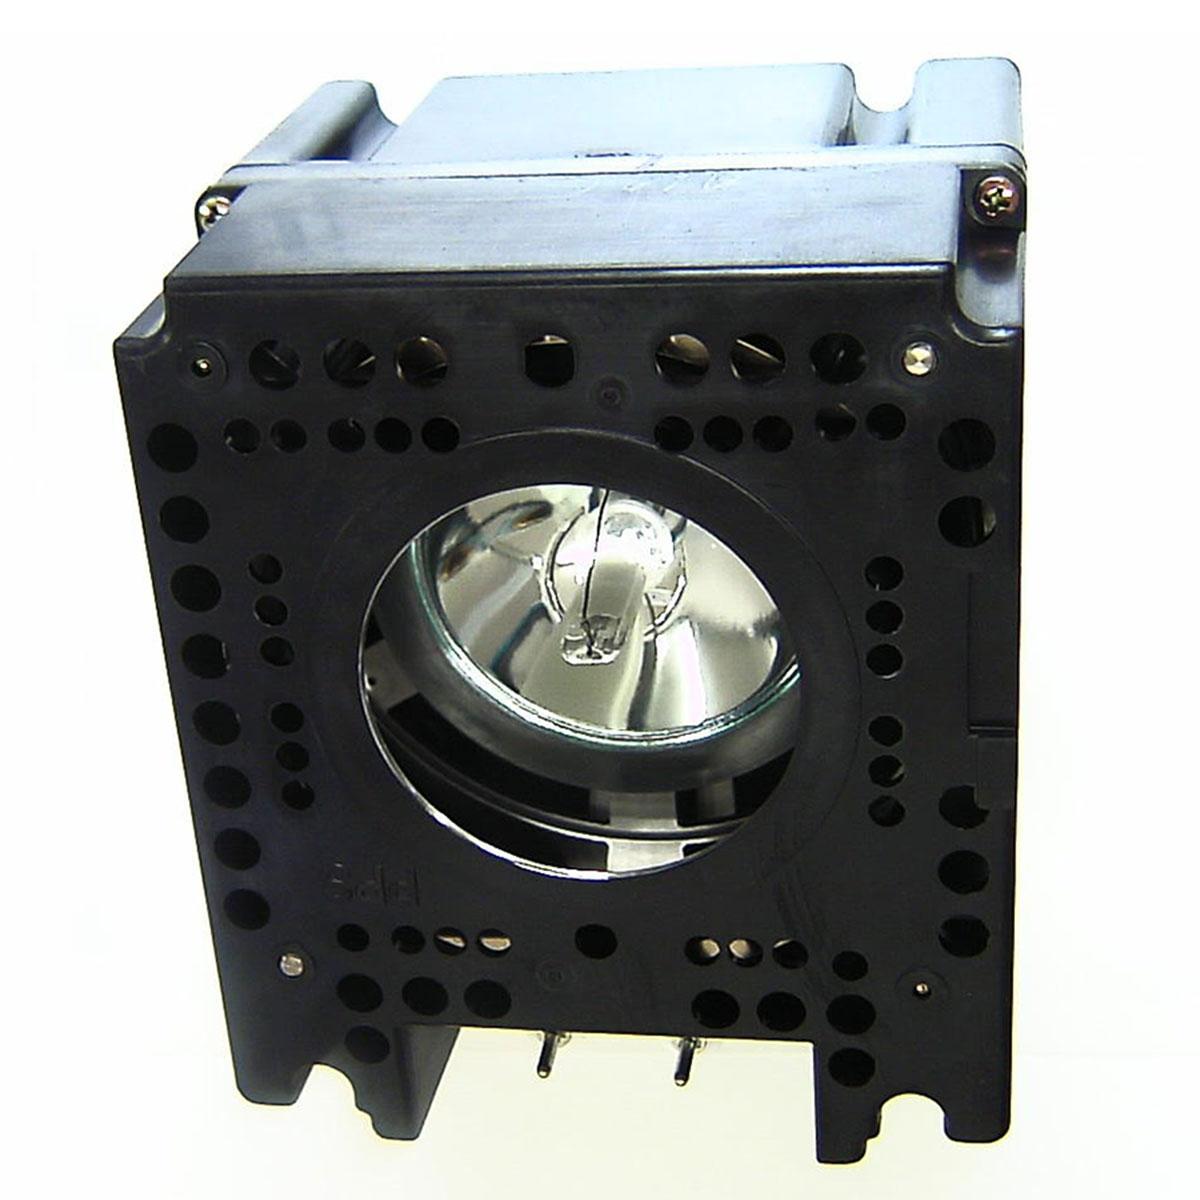 3M 78-6969-8131-1 Projector Lamp